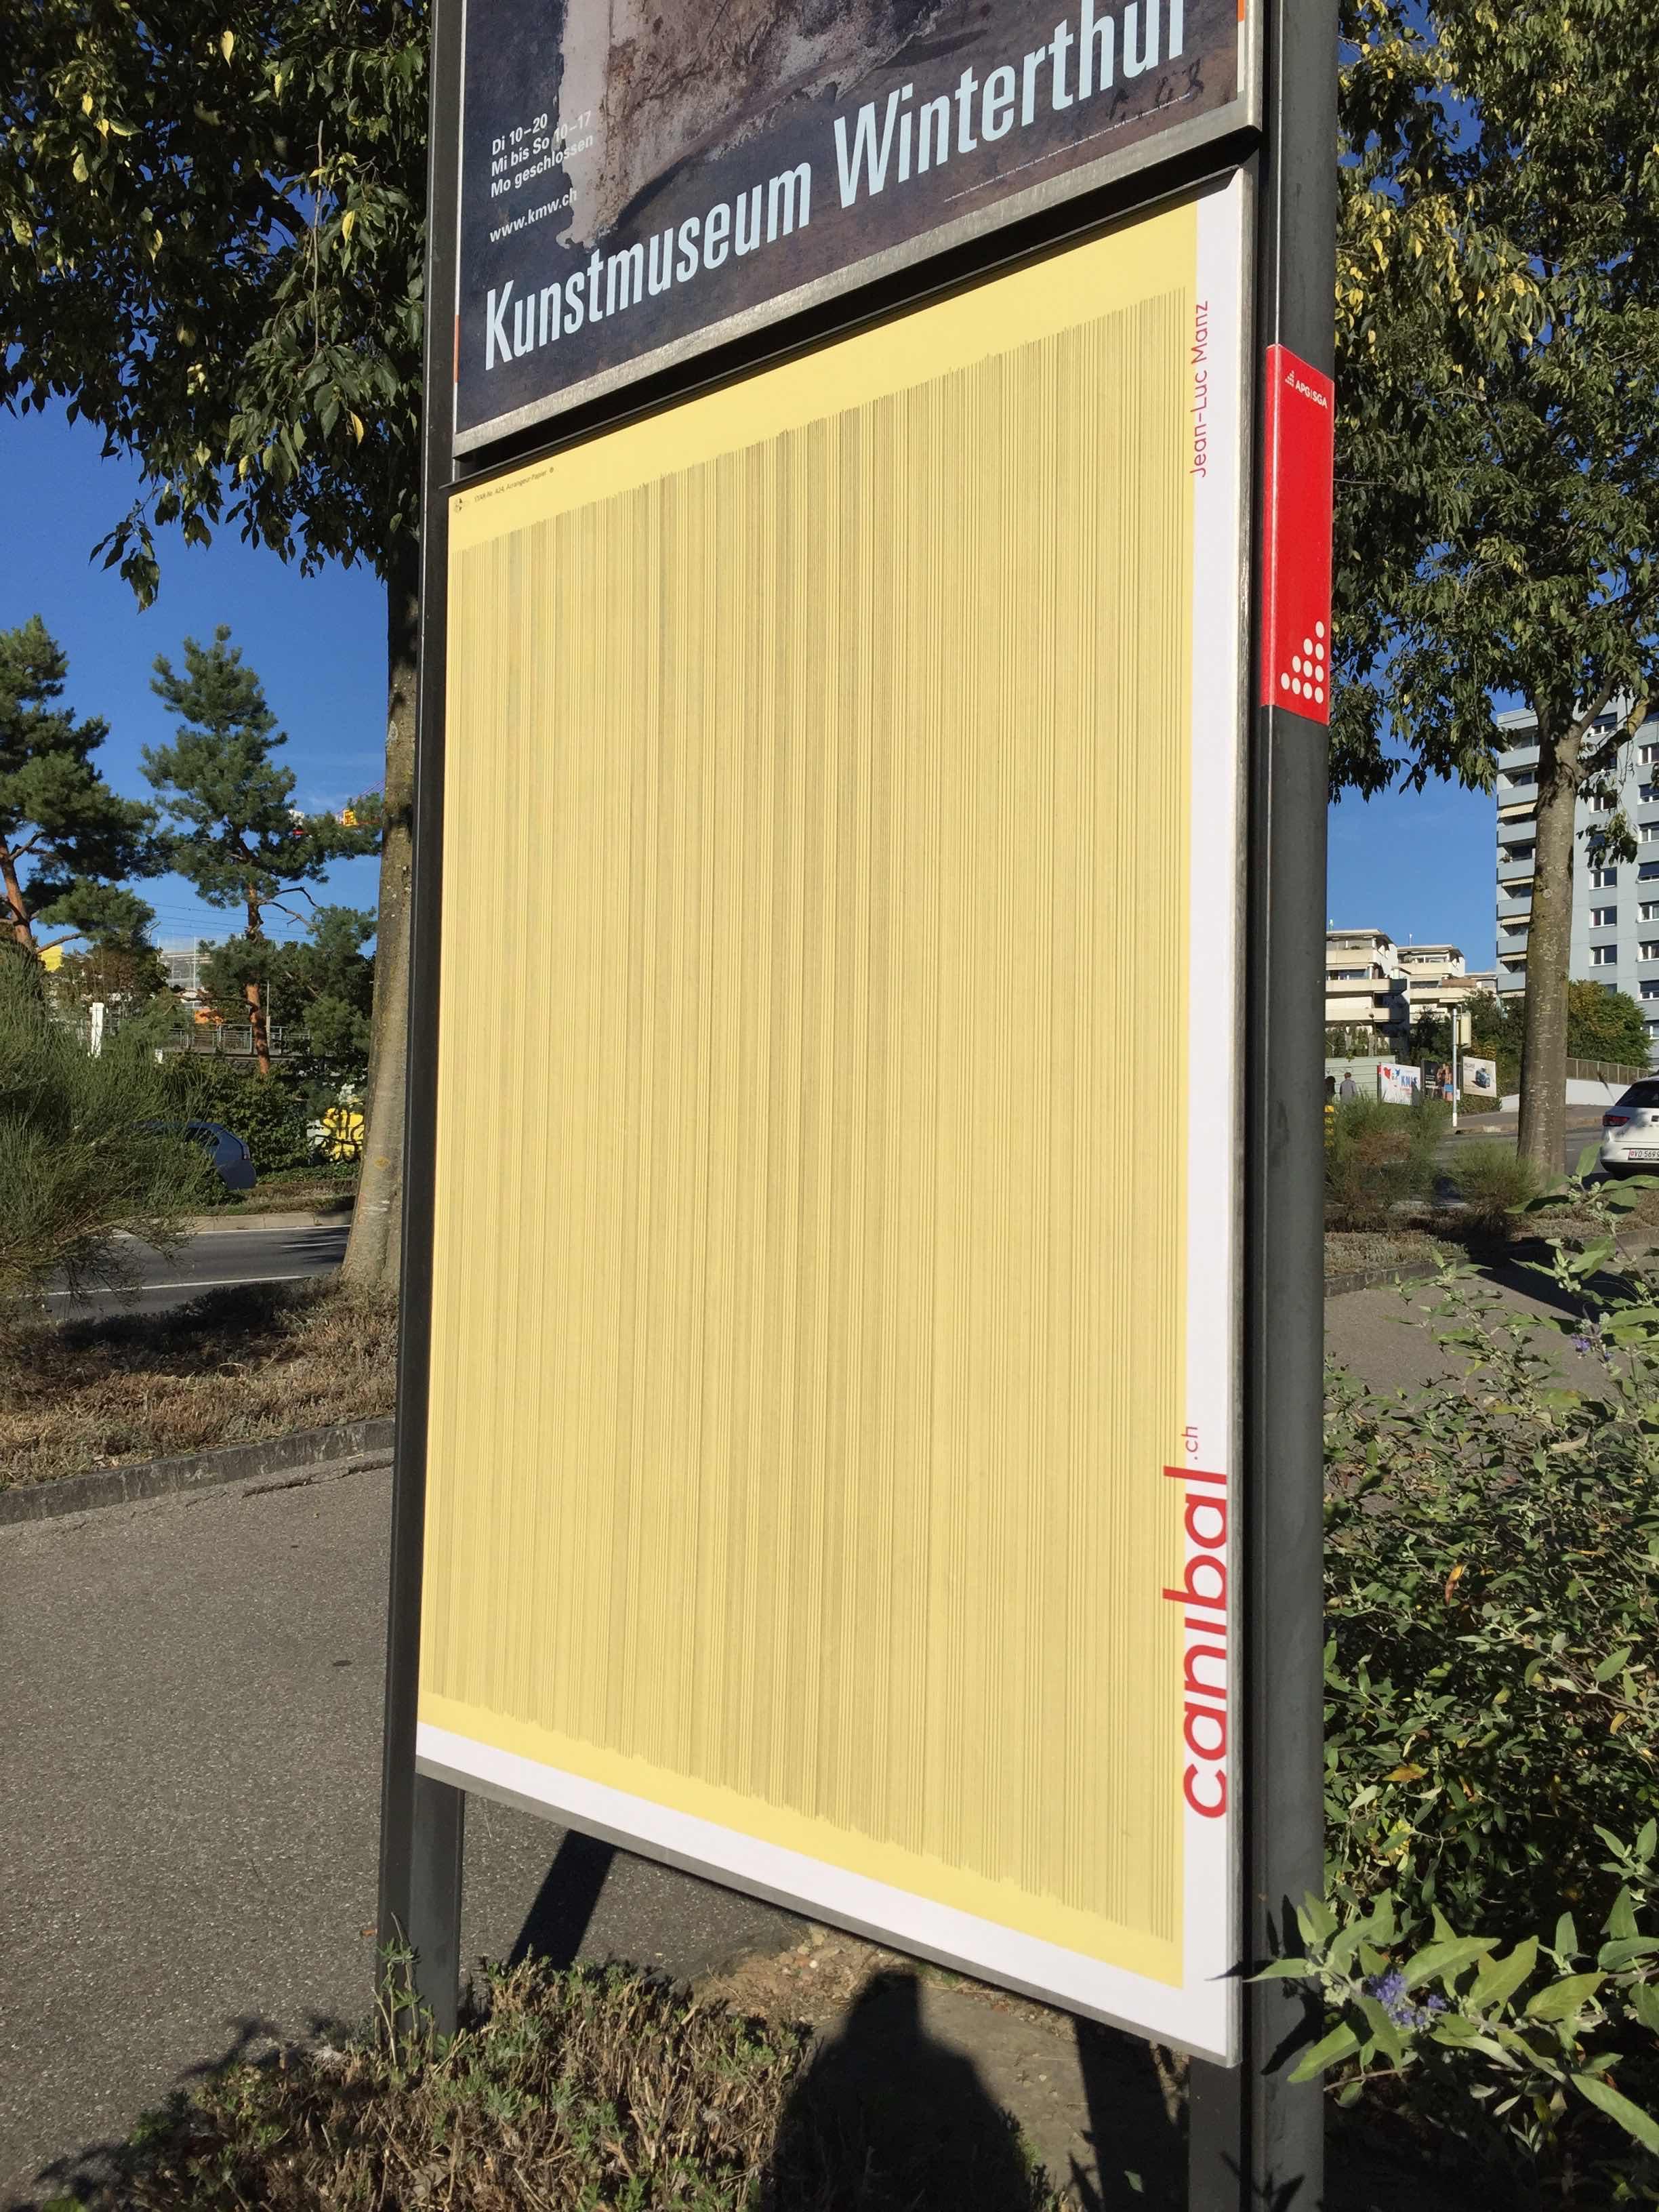 Jean-Luc Manz, avenue de tivoli 25, Lausanne-IMG_5890